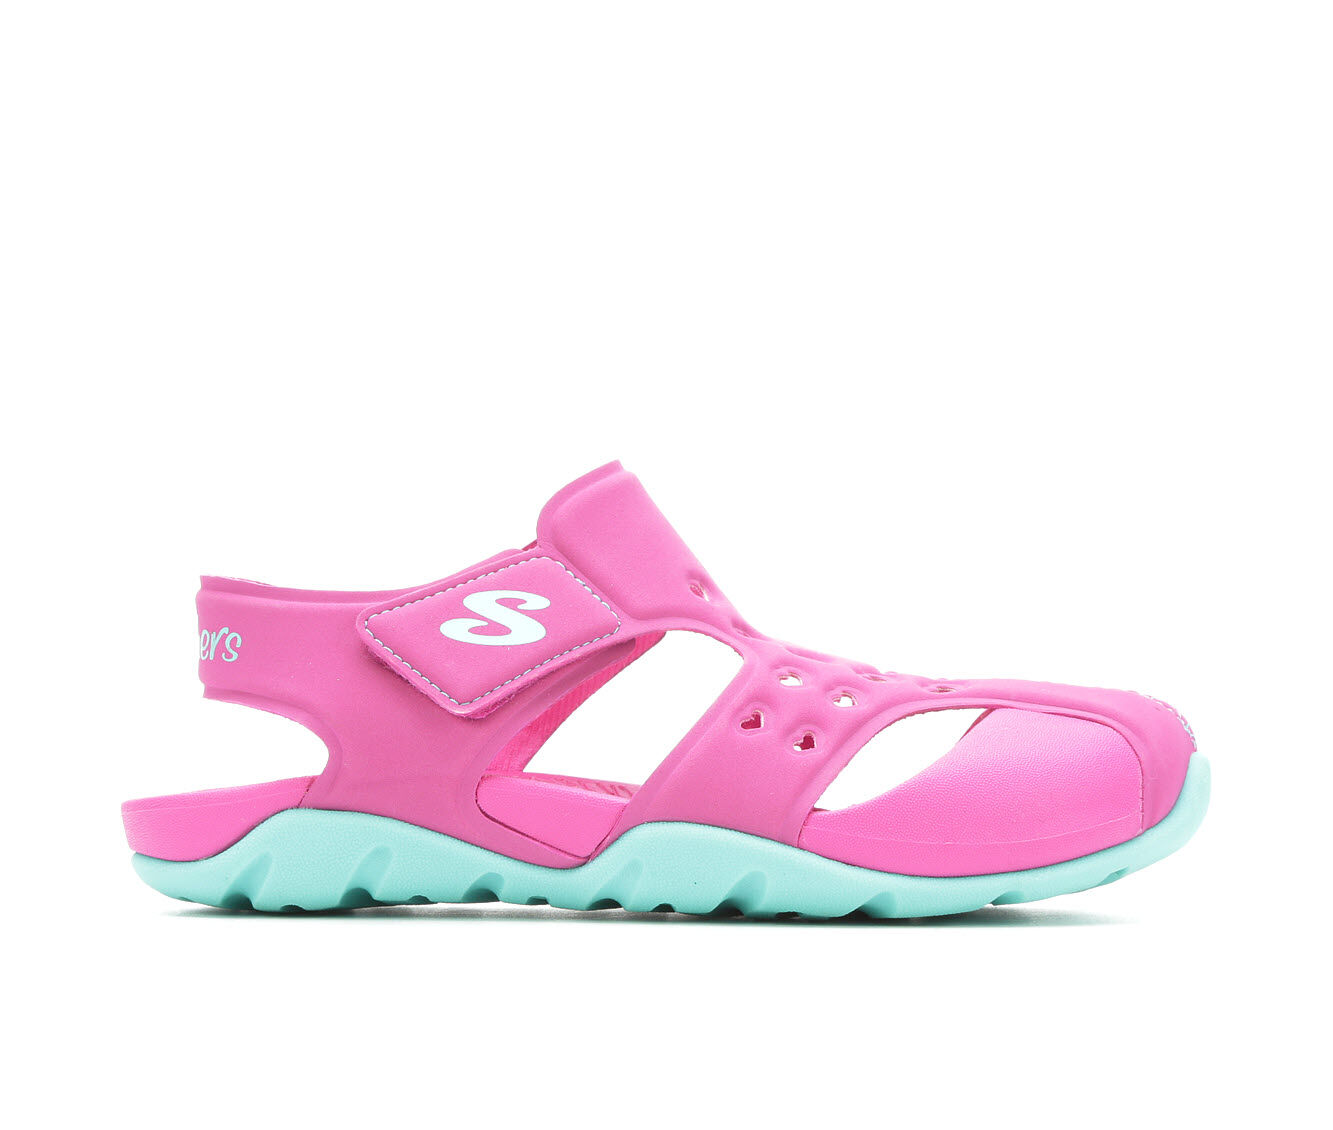 Girls' Skechers Little Kid Heart Bliss Outdoor Shoes